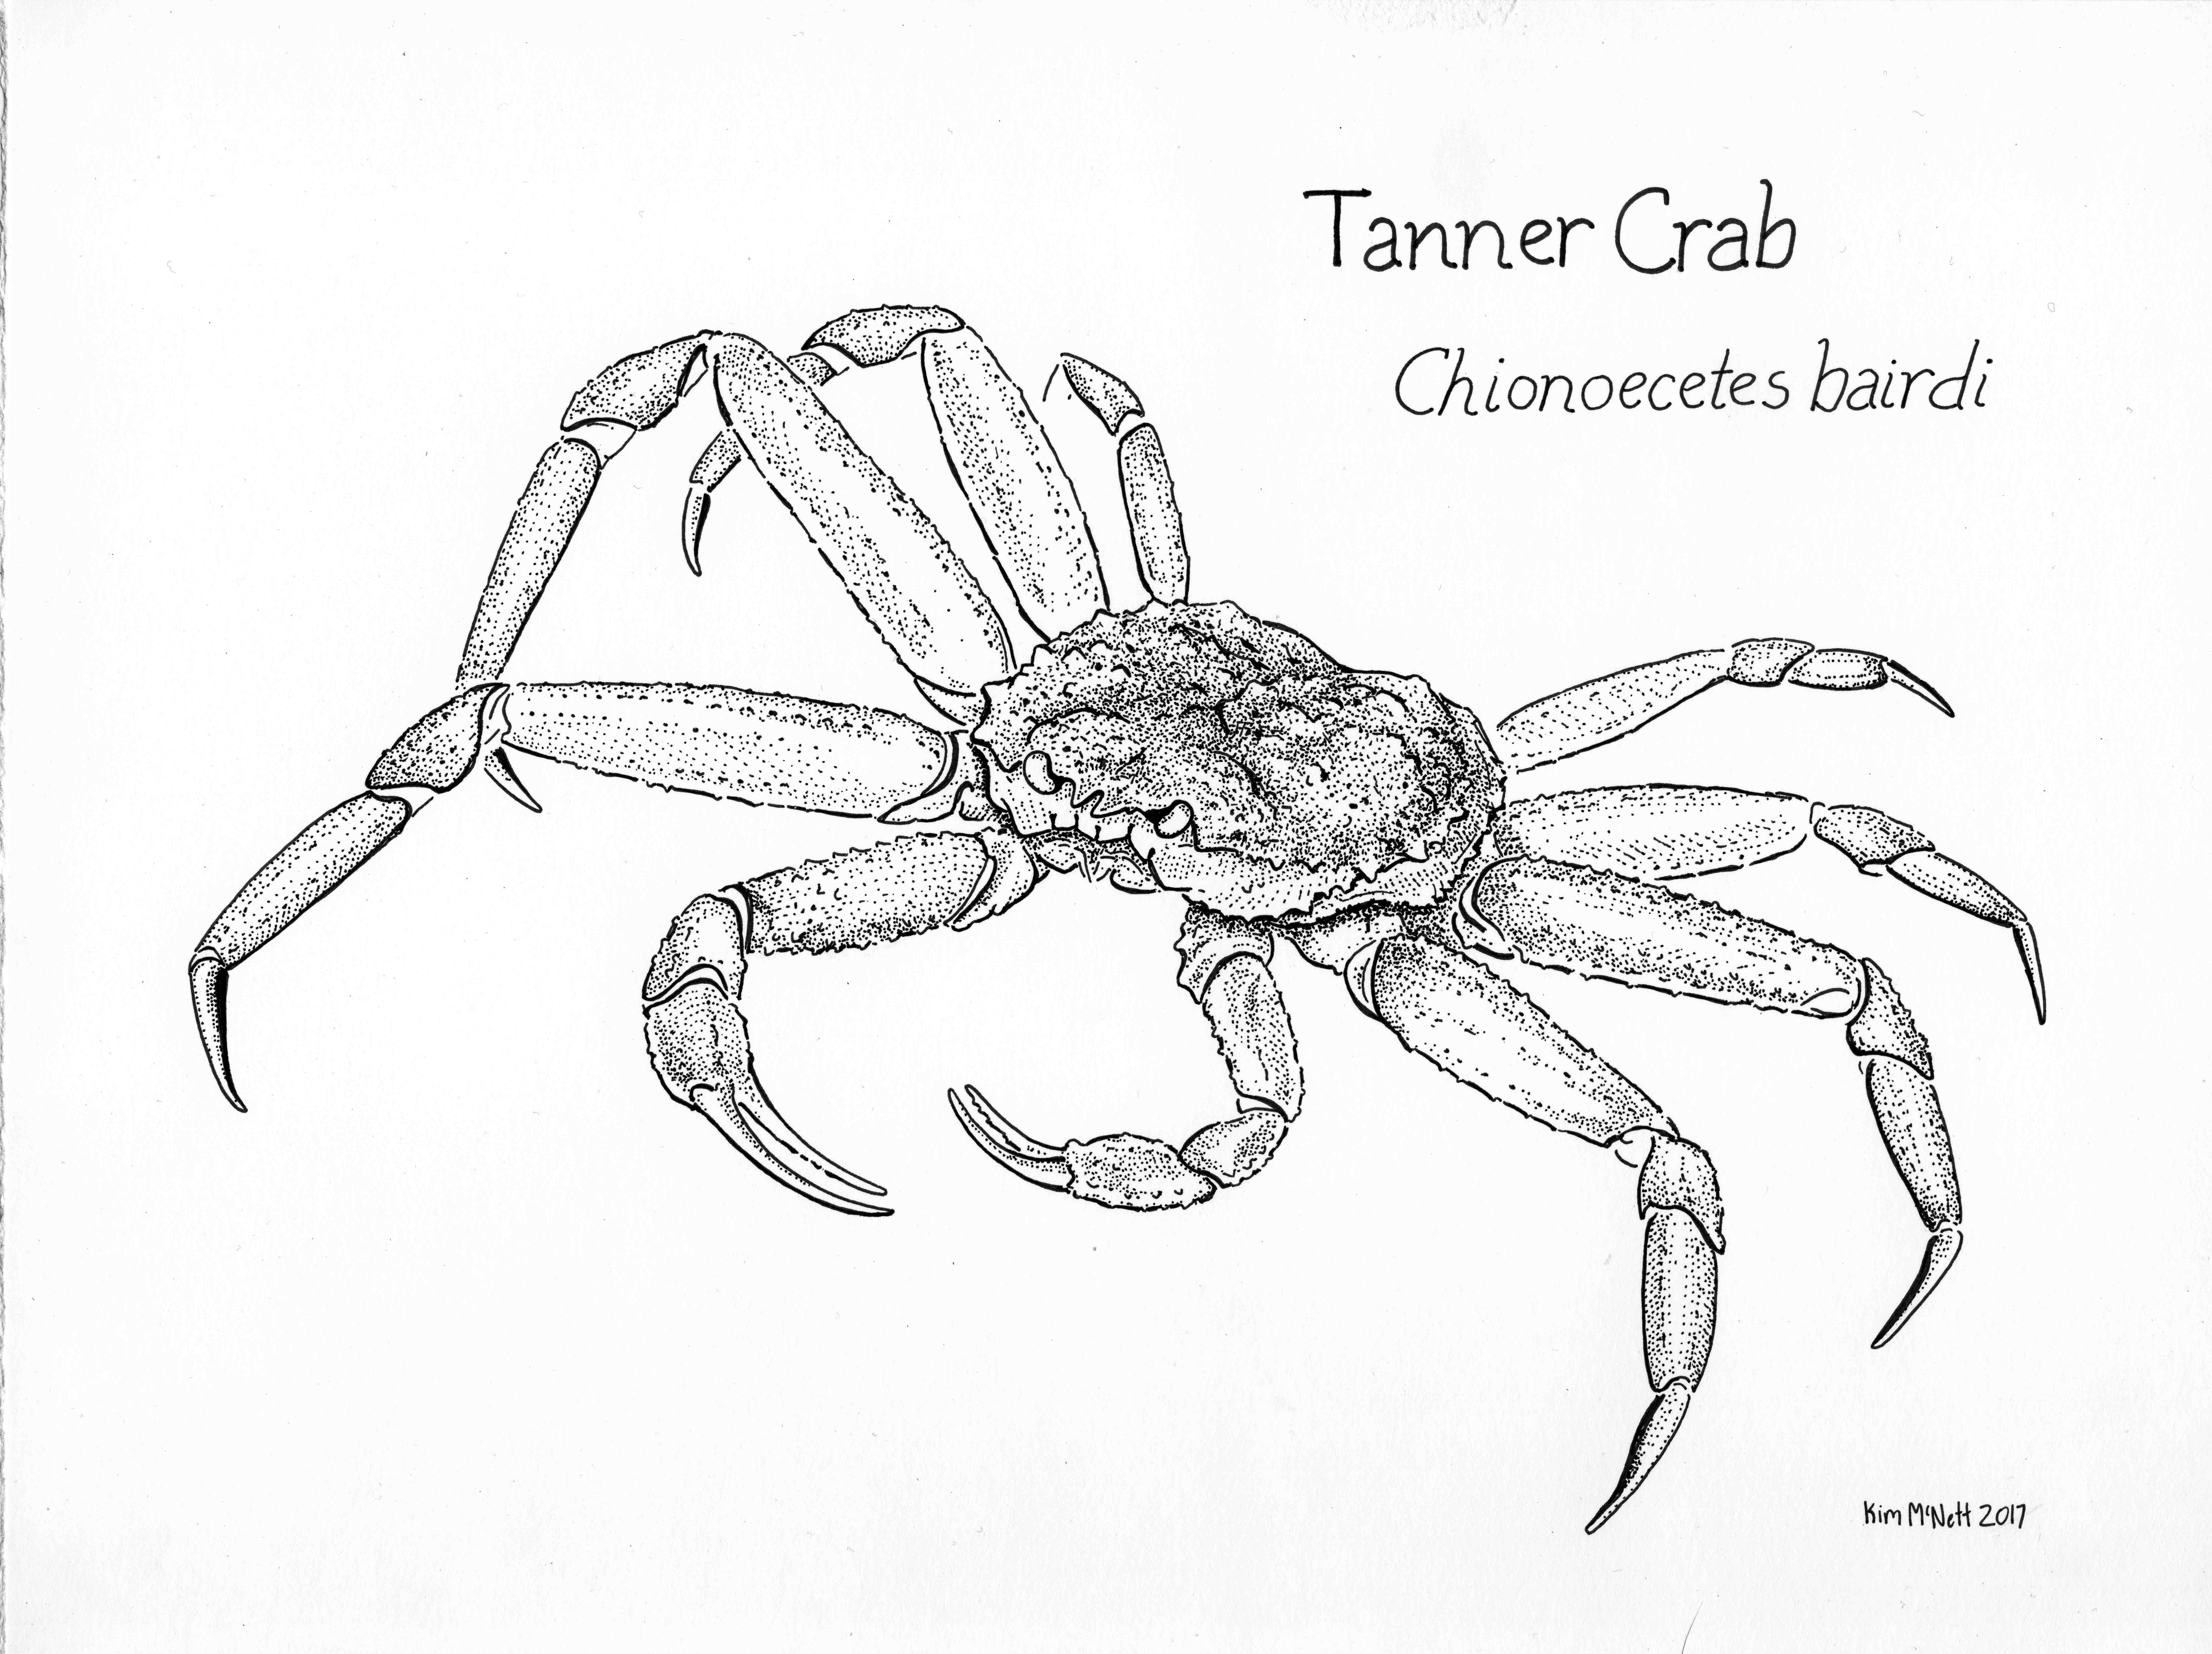 Tanner Crab Cionoecetes bairdi drawing